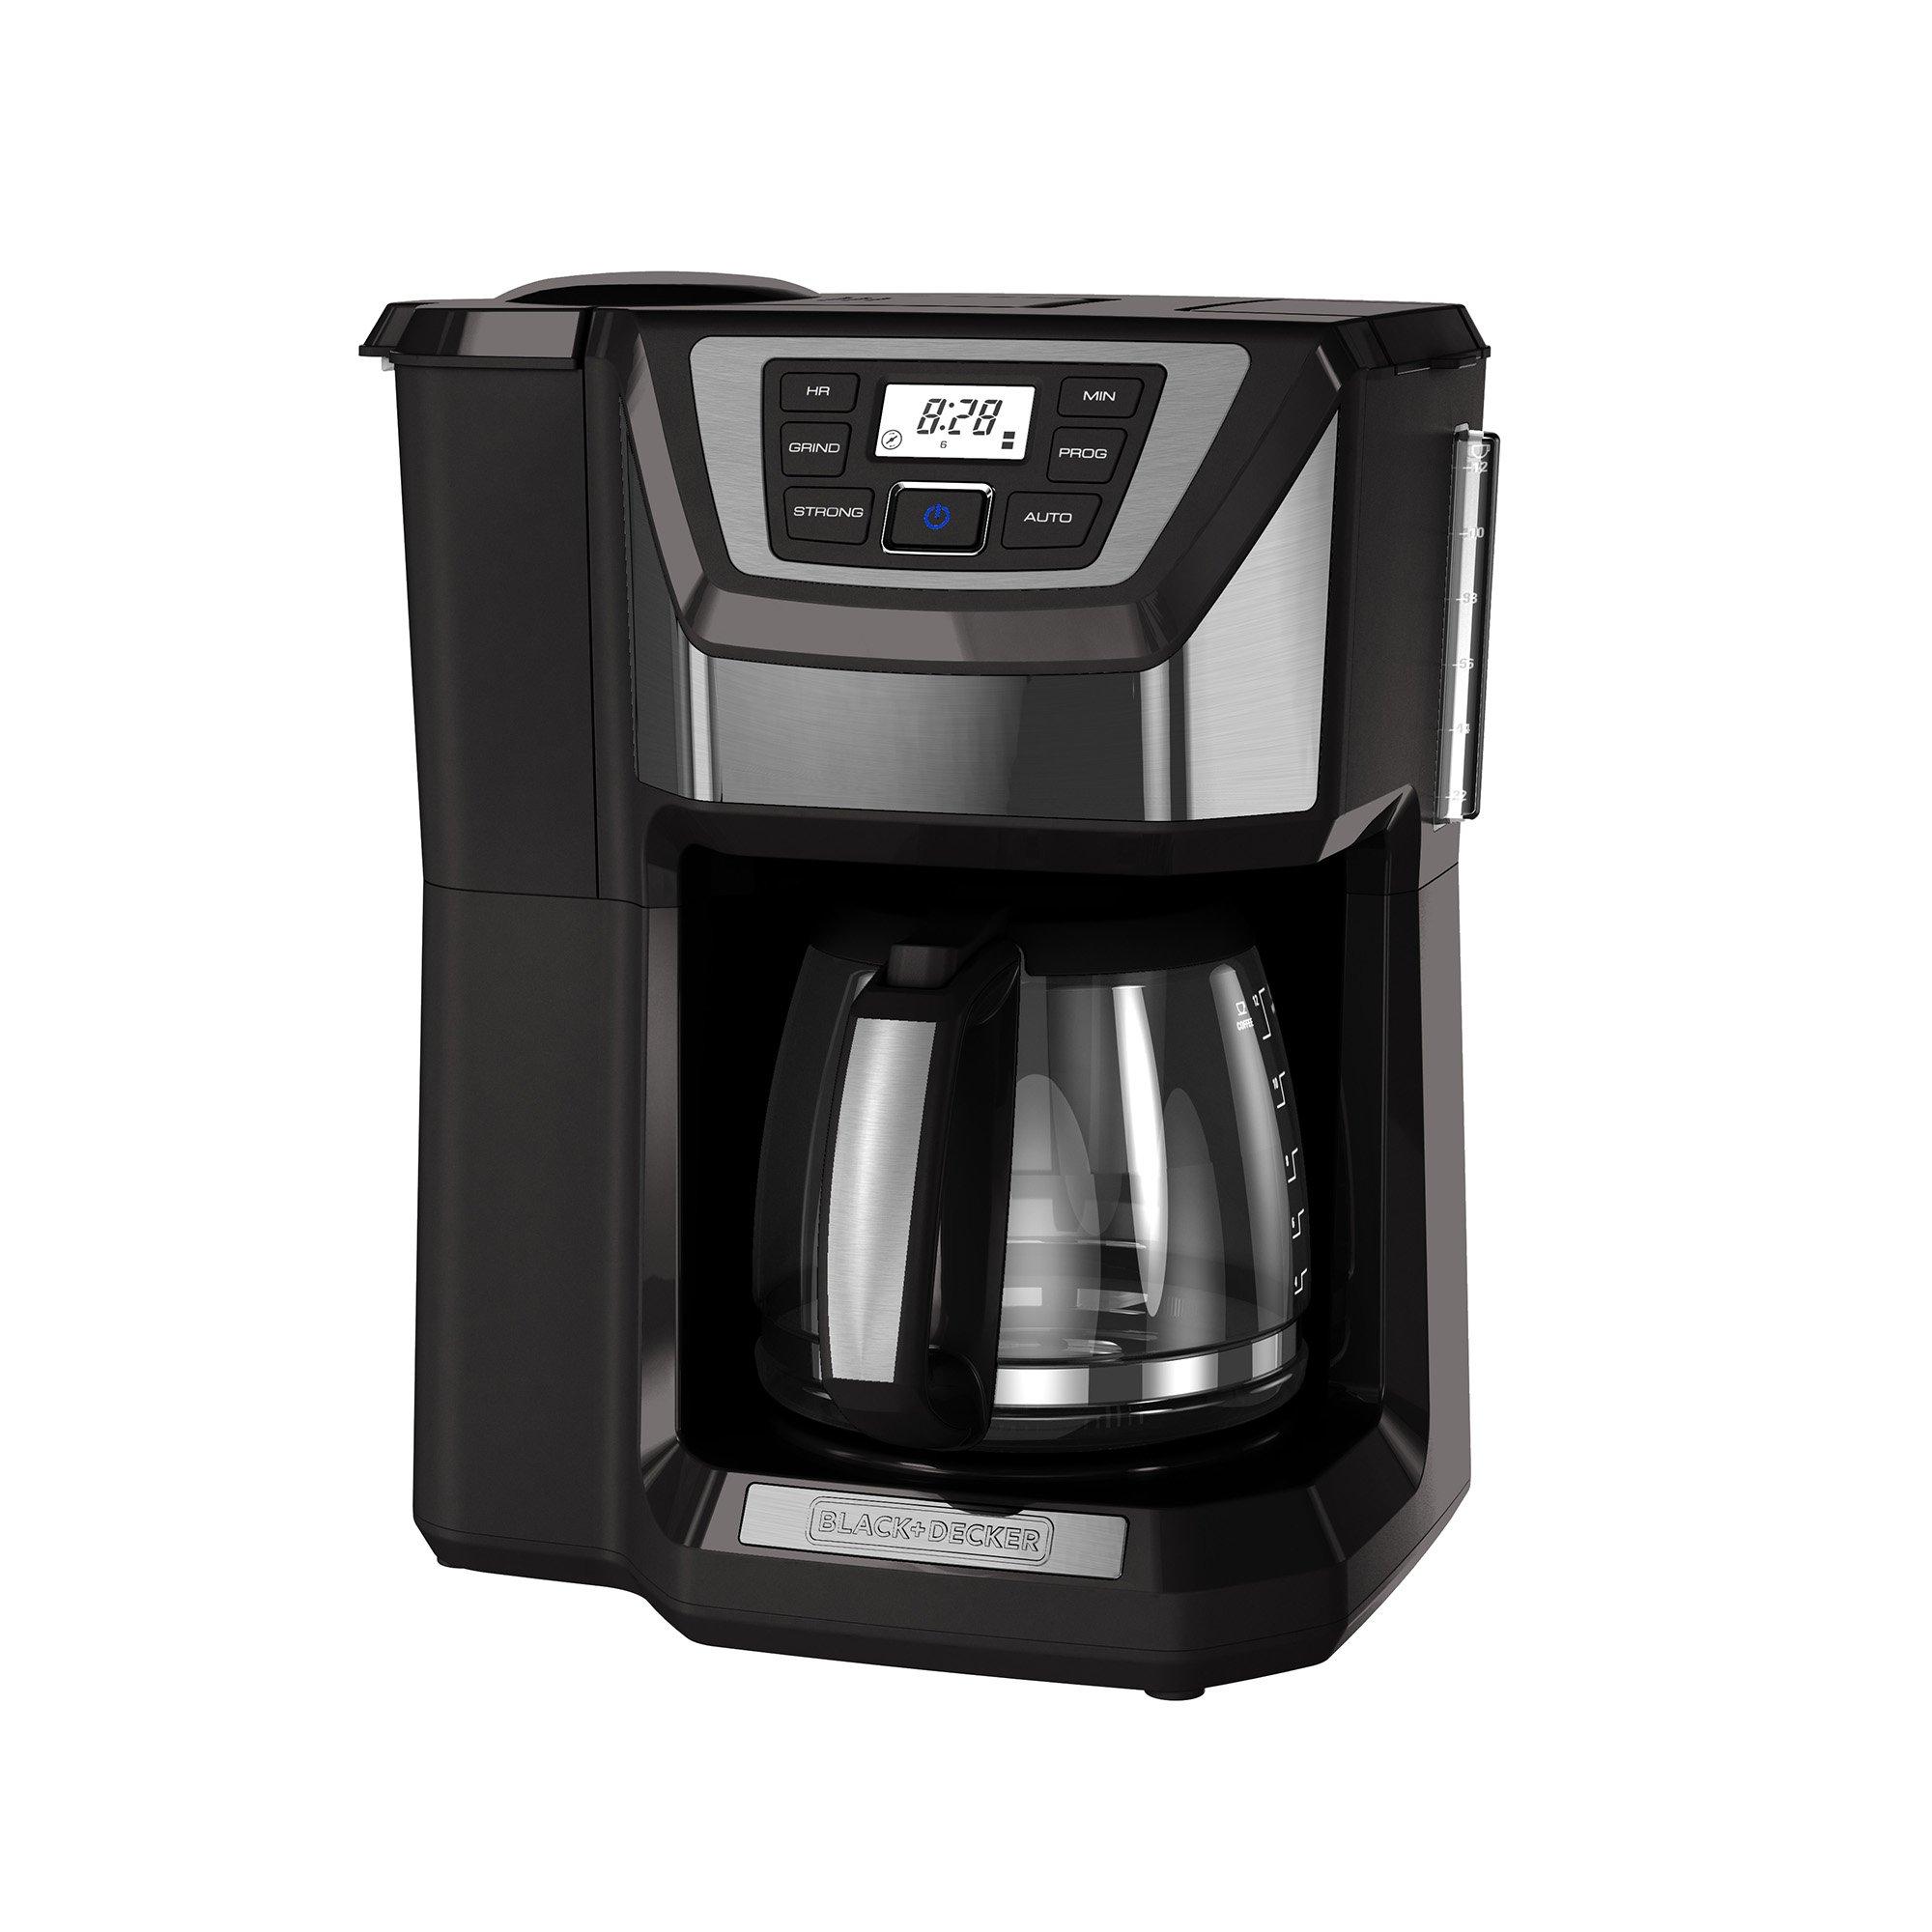 BLACK+DECKER CM5000GD 12-Cup Mill and Brew Coffee Maker, Black/Grey by BLACK+DECKER